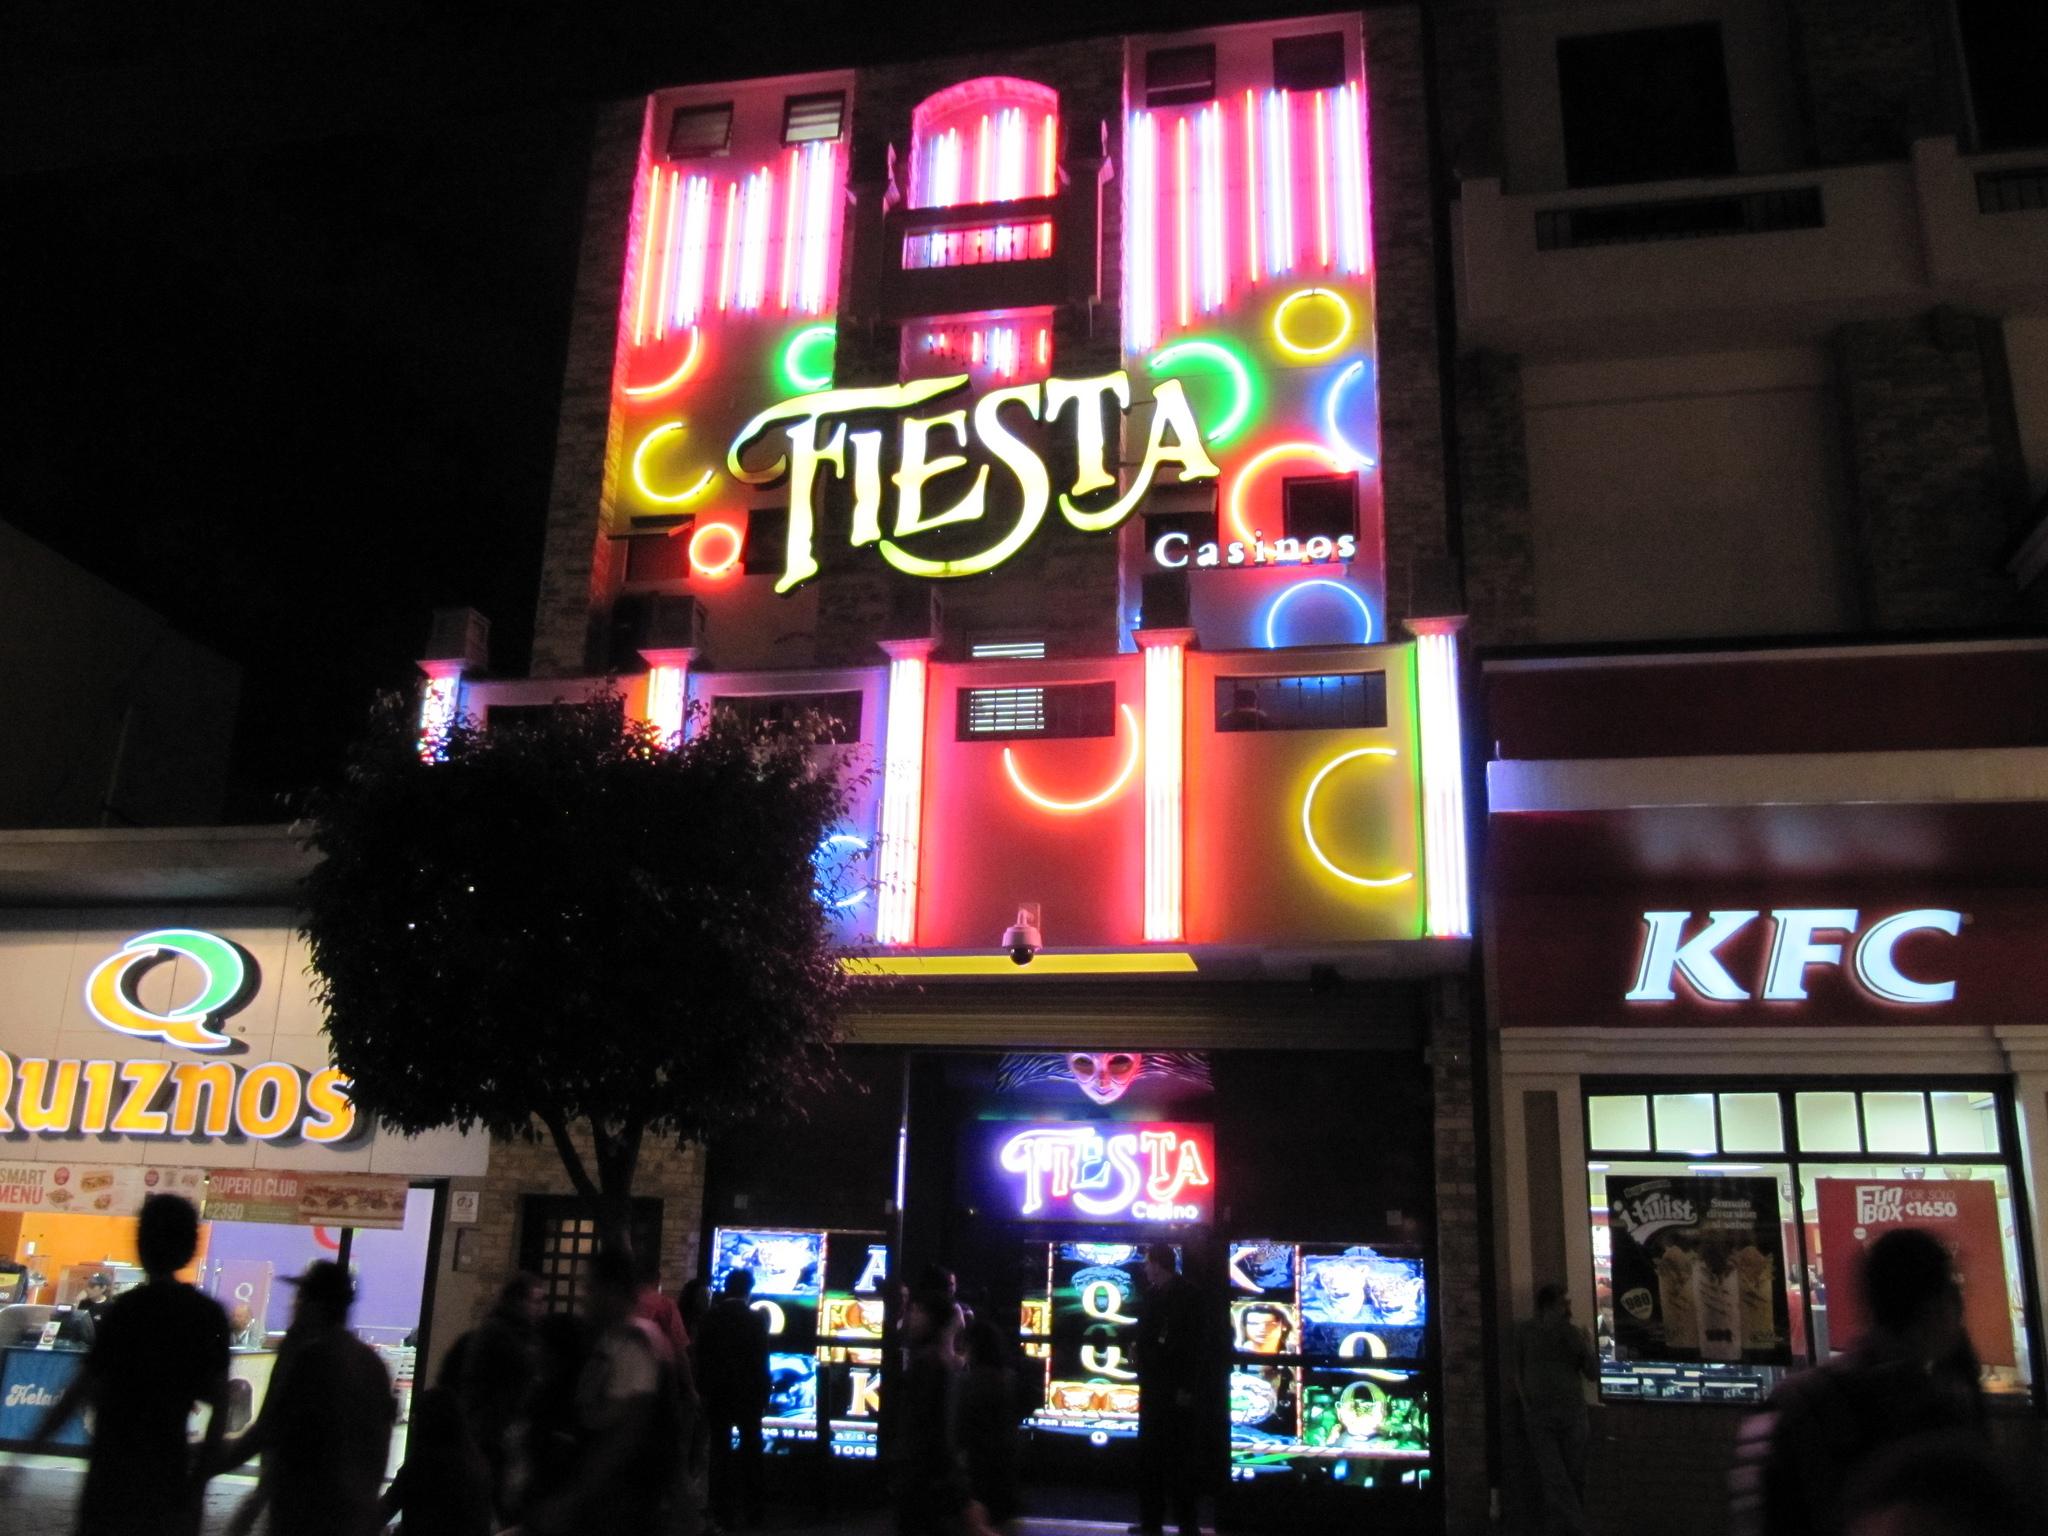 Gambling is surprisingly popular in Costa Rican capital, San Jose. Image credit:  Leonora (Ellie) Enking / Creative Commons